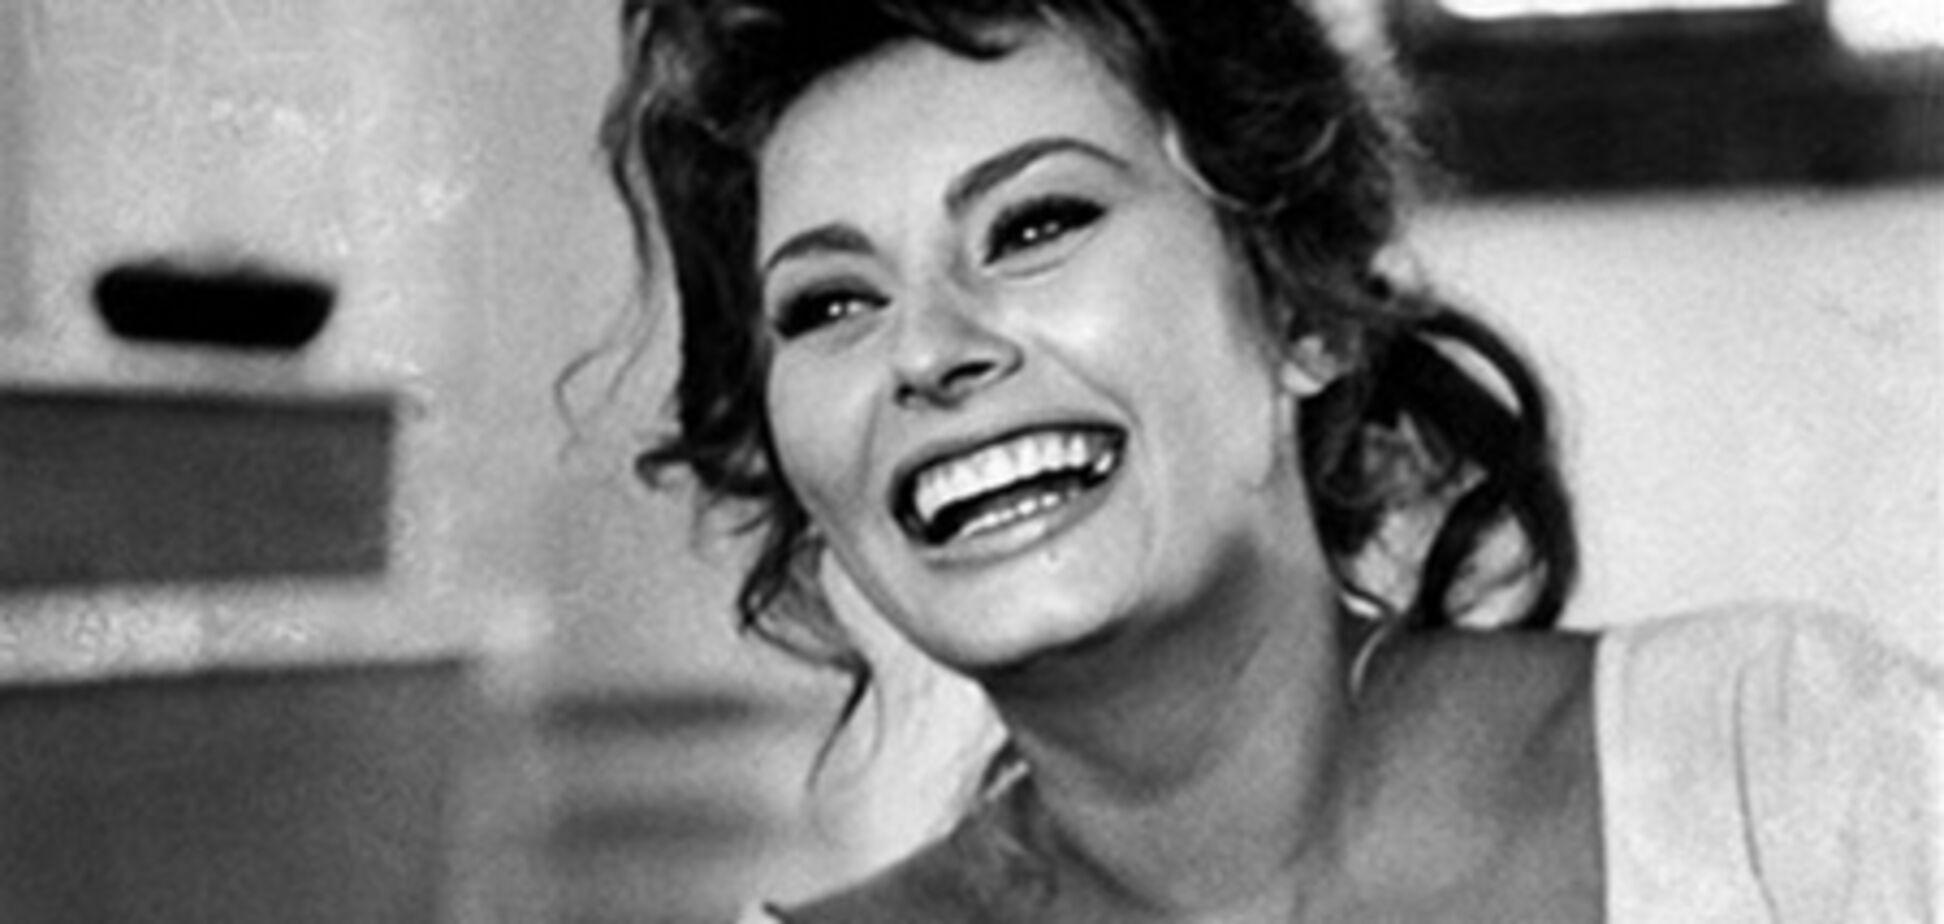 Софи Лорен исполнилось 78